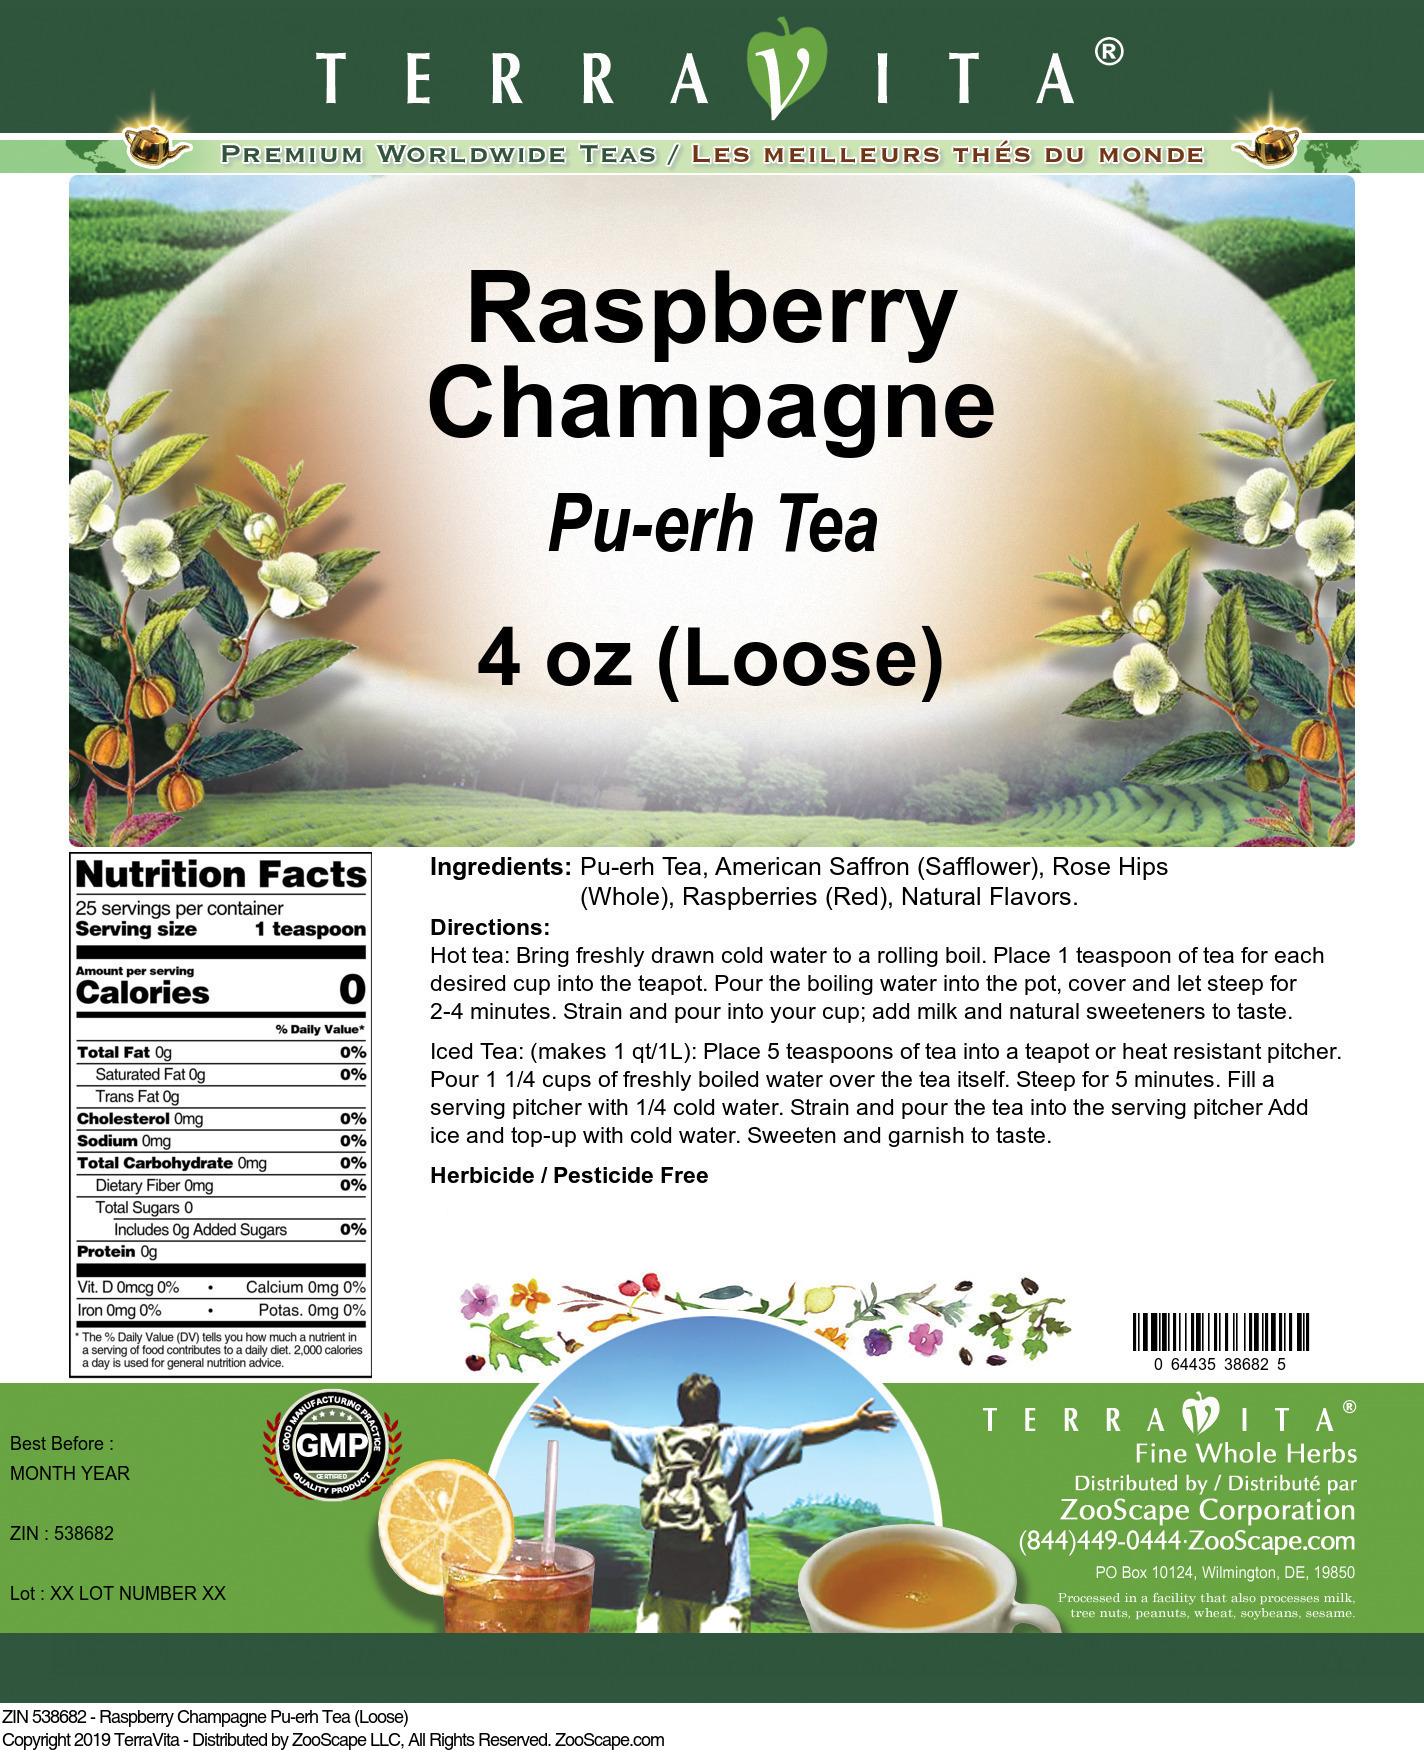 Raspberry Champagne Pu-erh Tea (Loose)